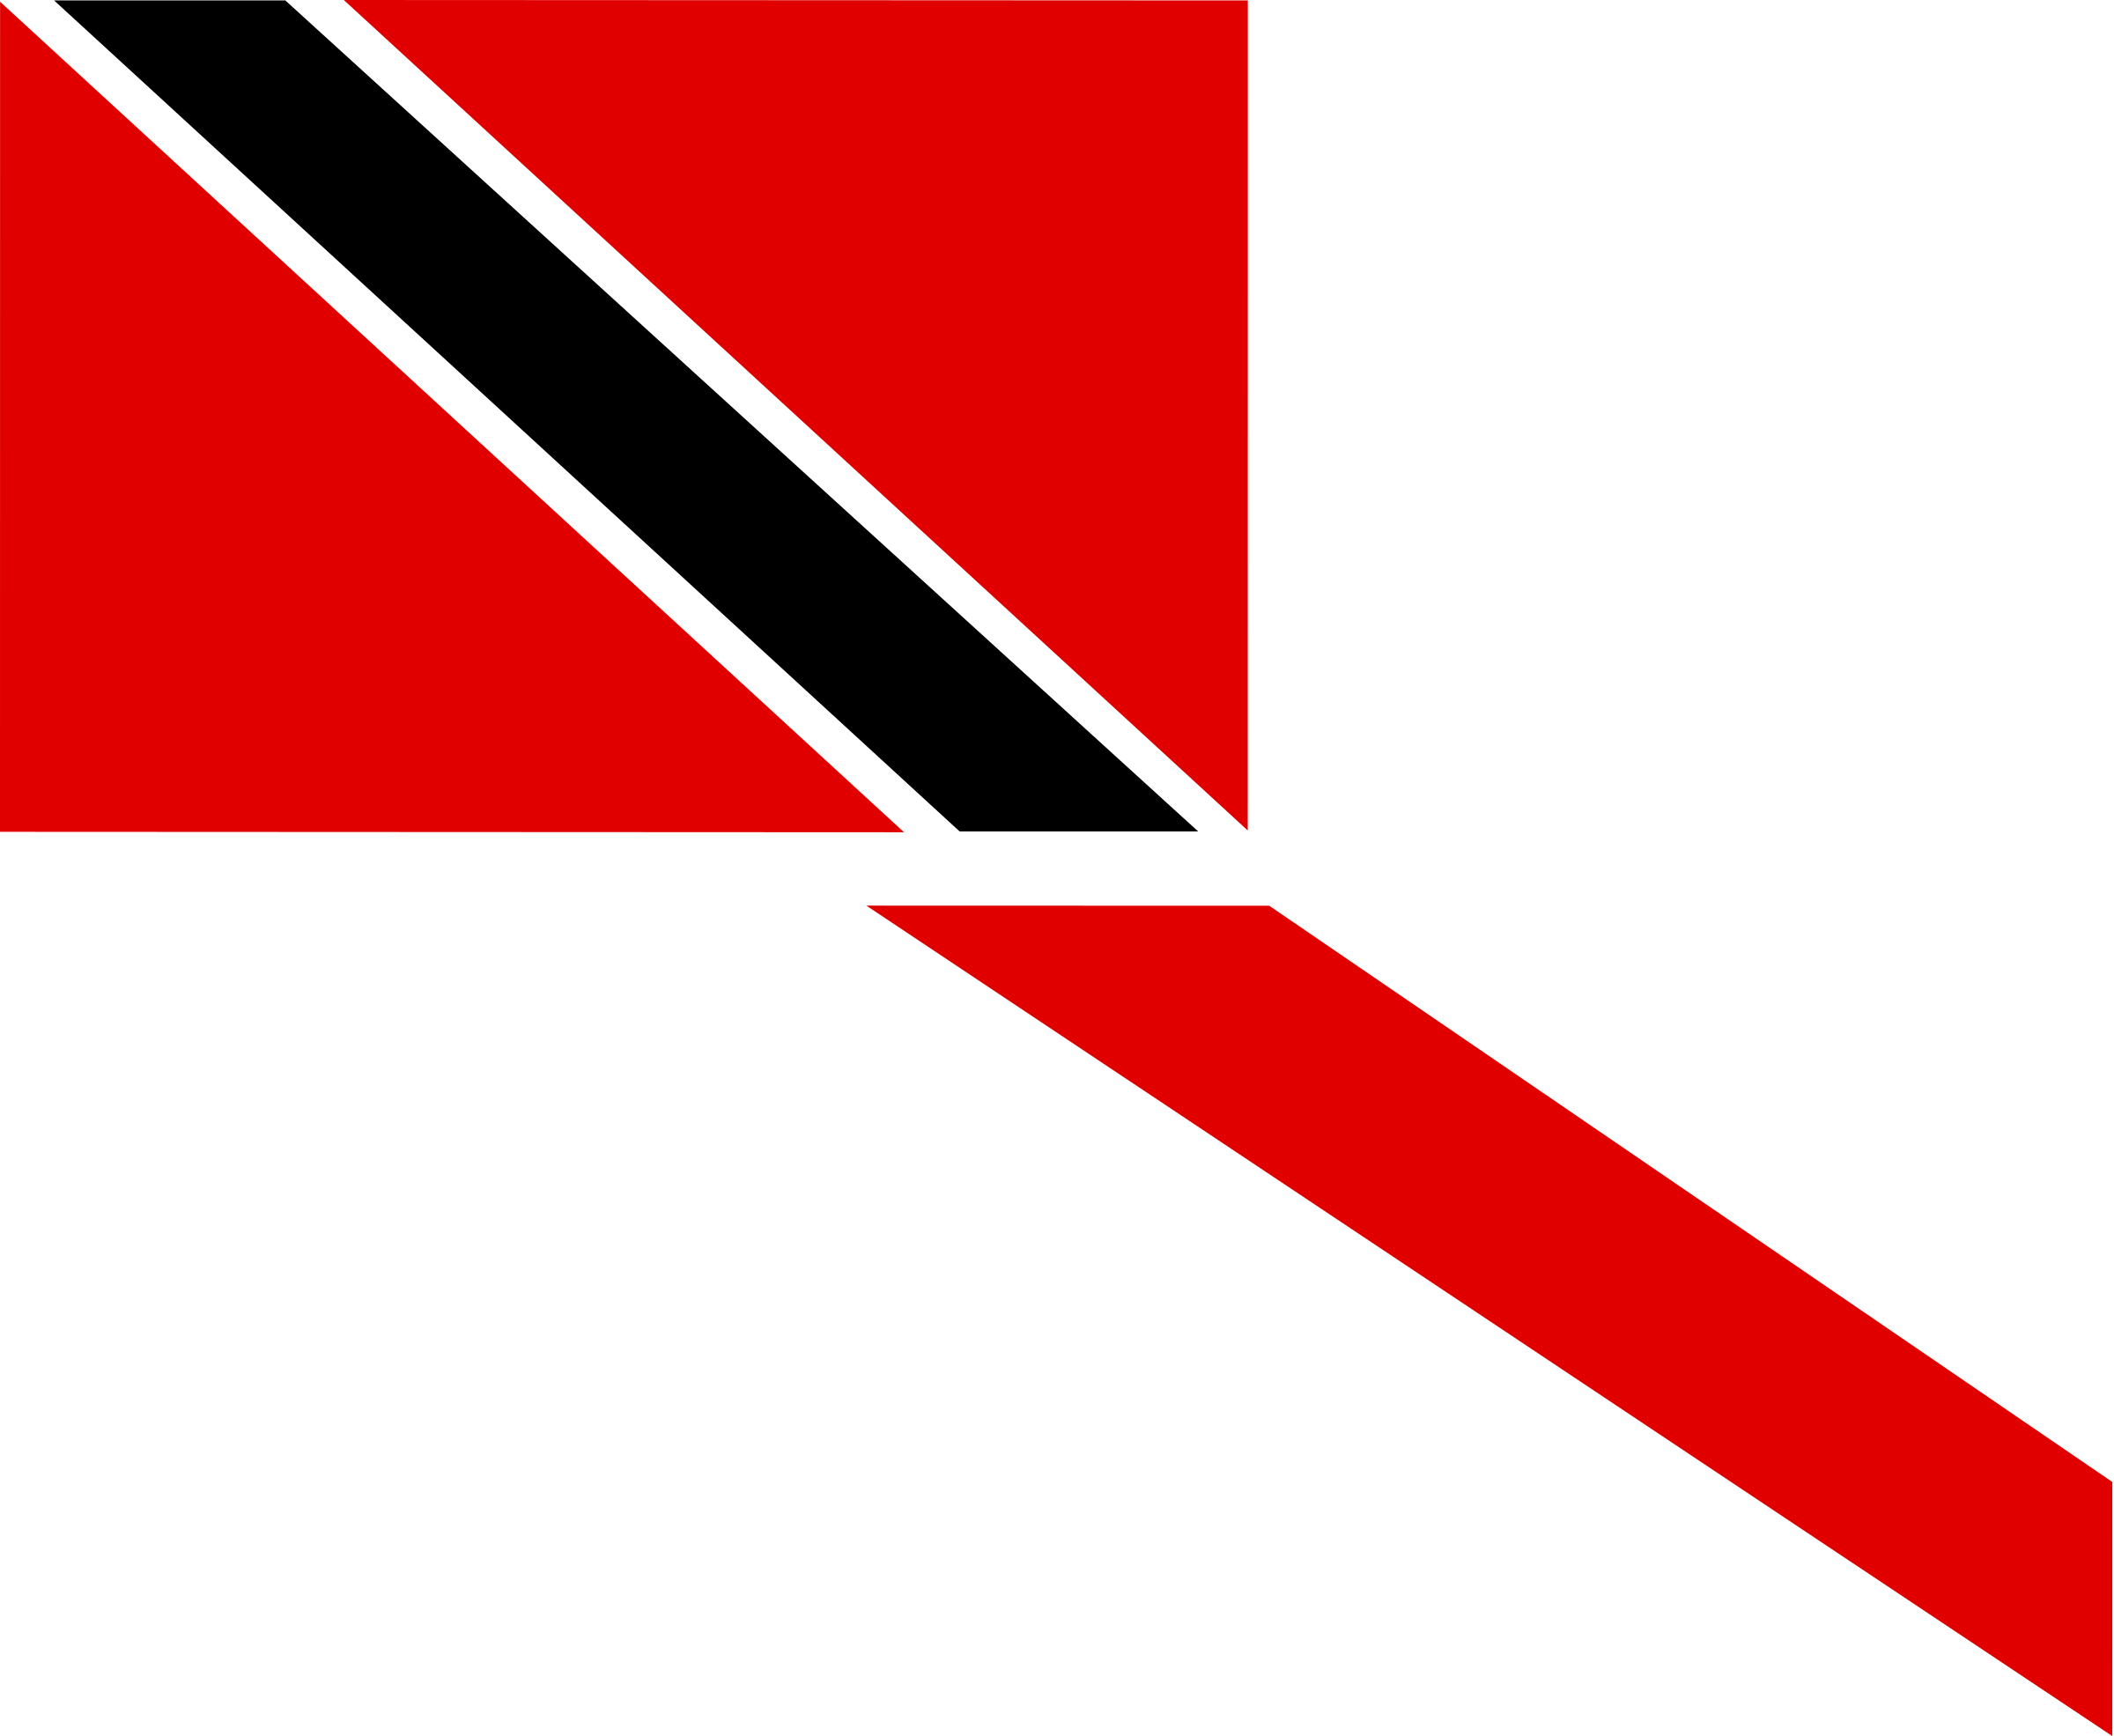 Clipart svg trinidad flag vector Clipart - flag of Trinidad and Tobago vector